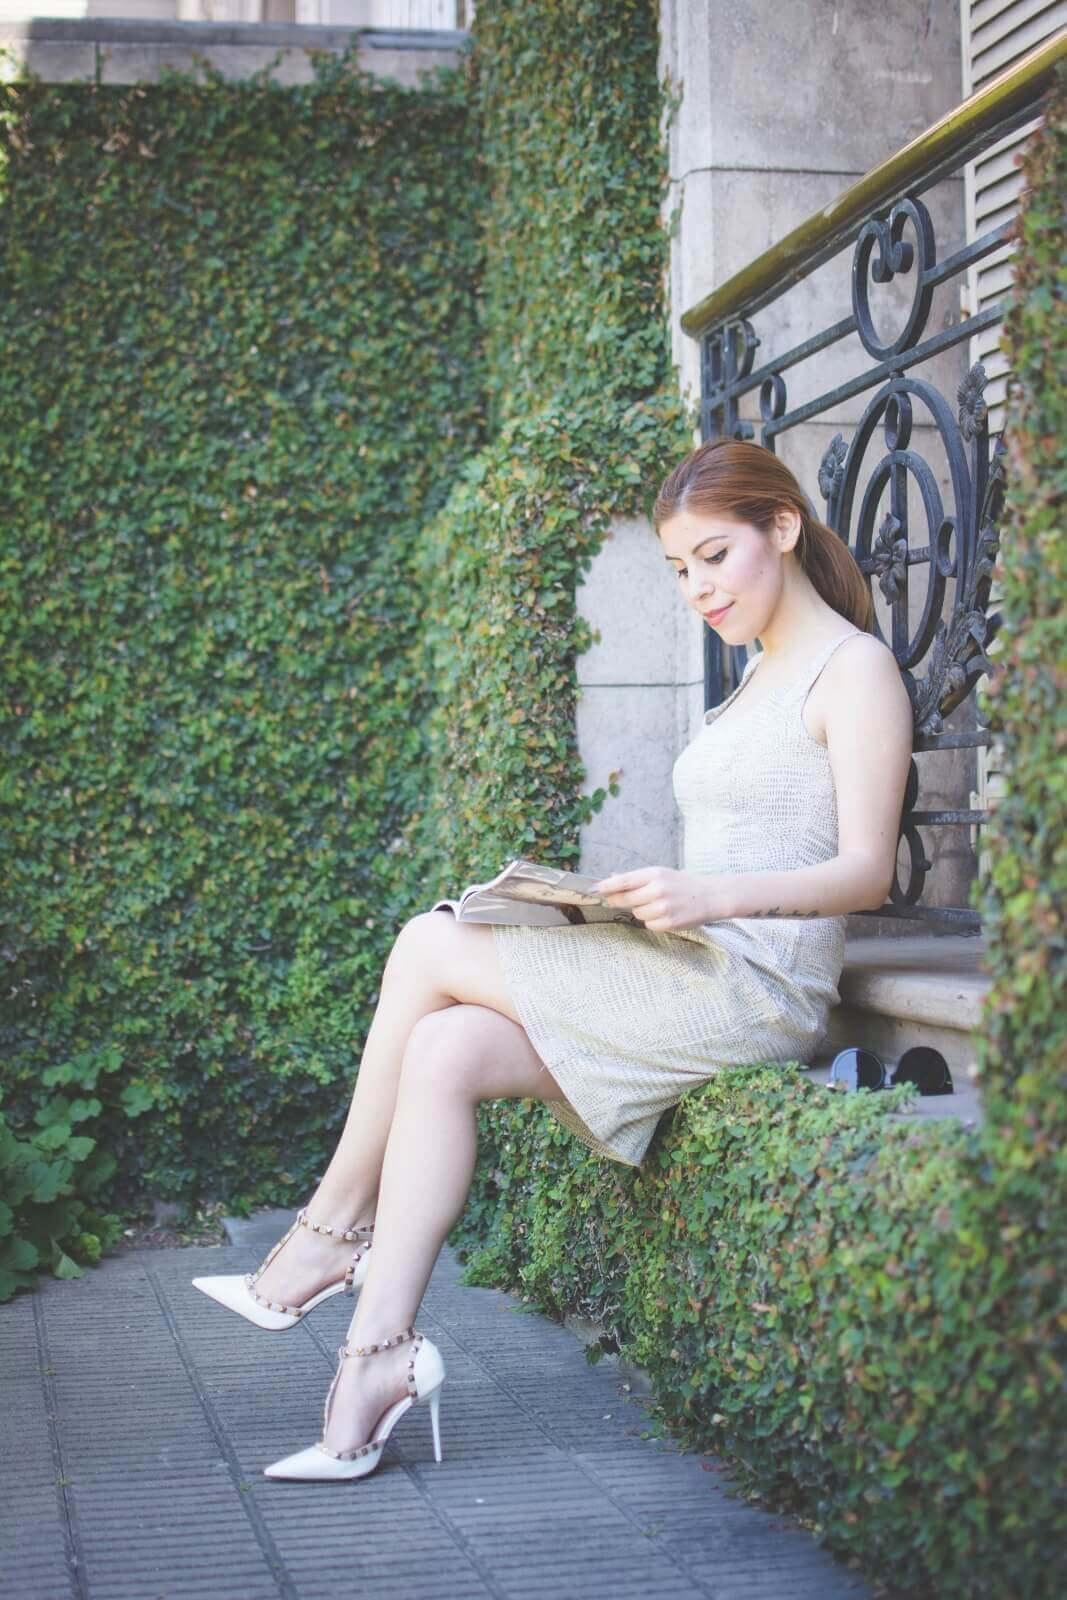 almond-white-dress-sammydress-stilettos-valentino-rockstud-imitation-deborah-ferrero-style-by-deb-ladylike08